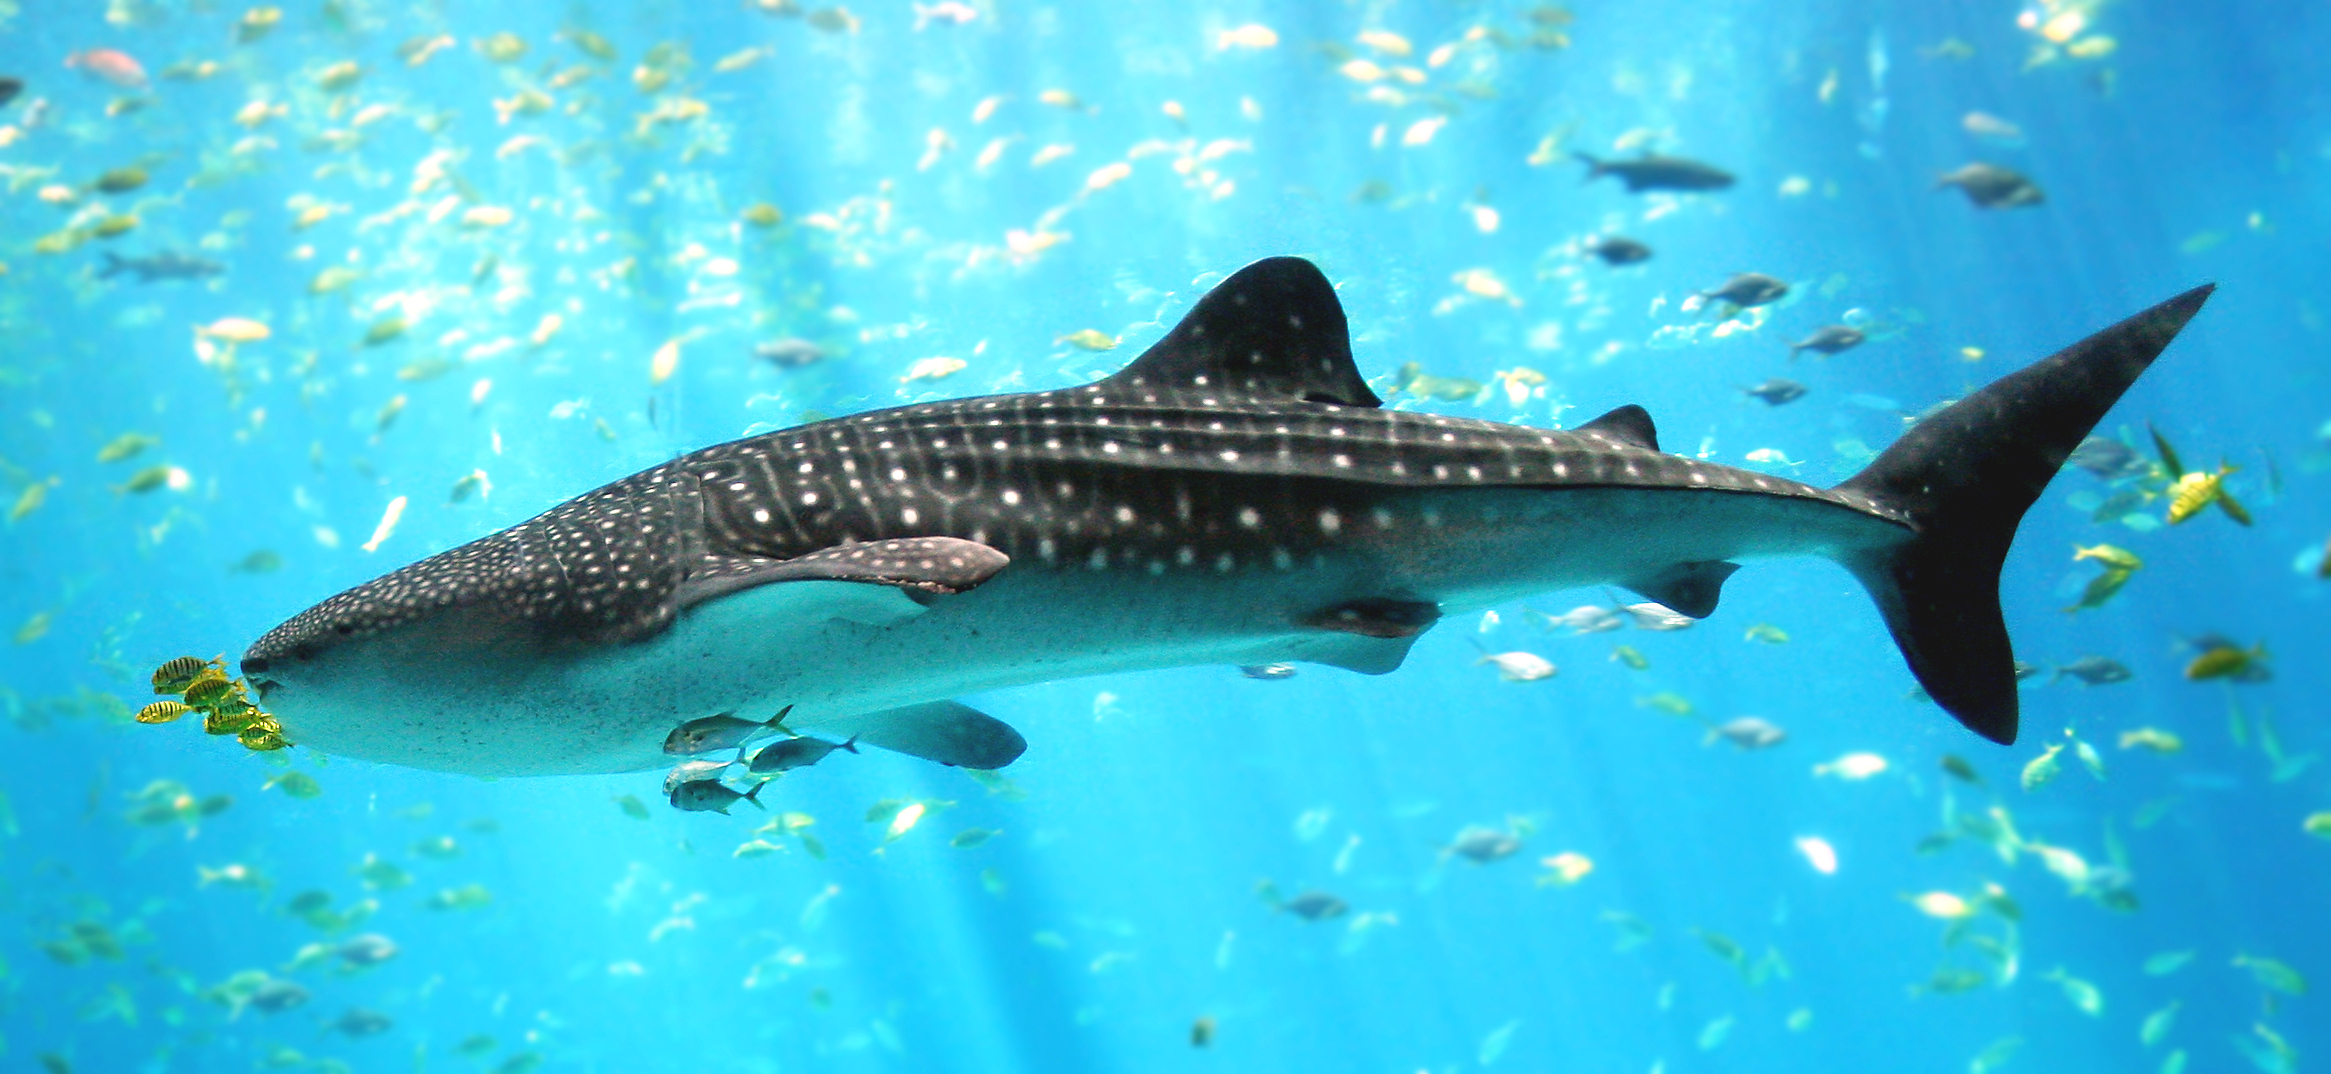 Whale shark, Georgia Aquarium